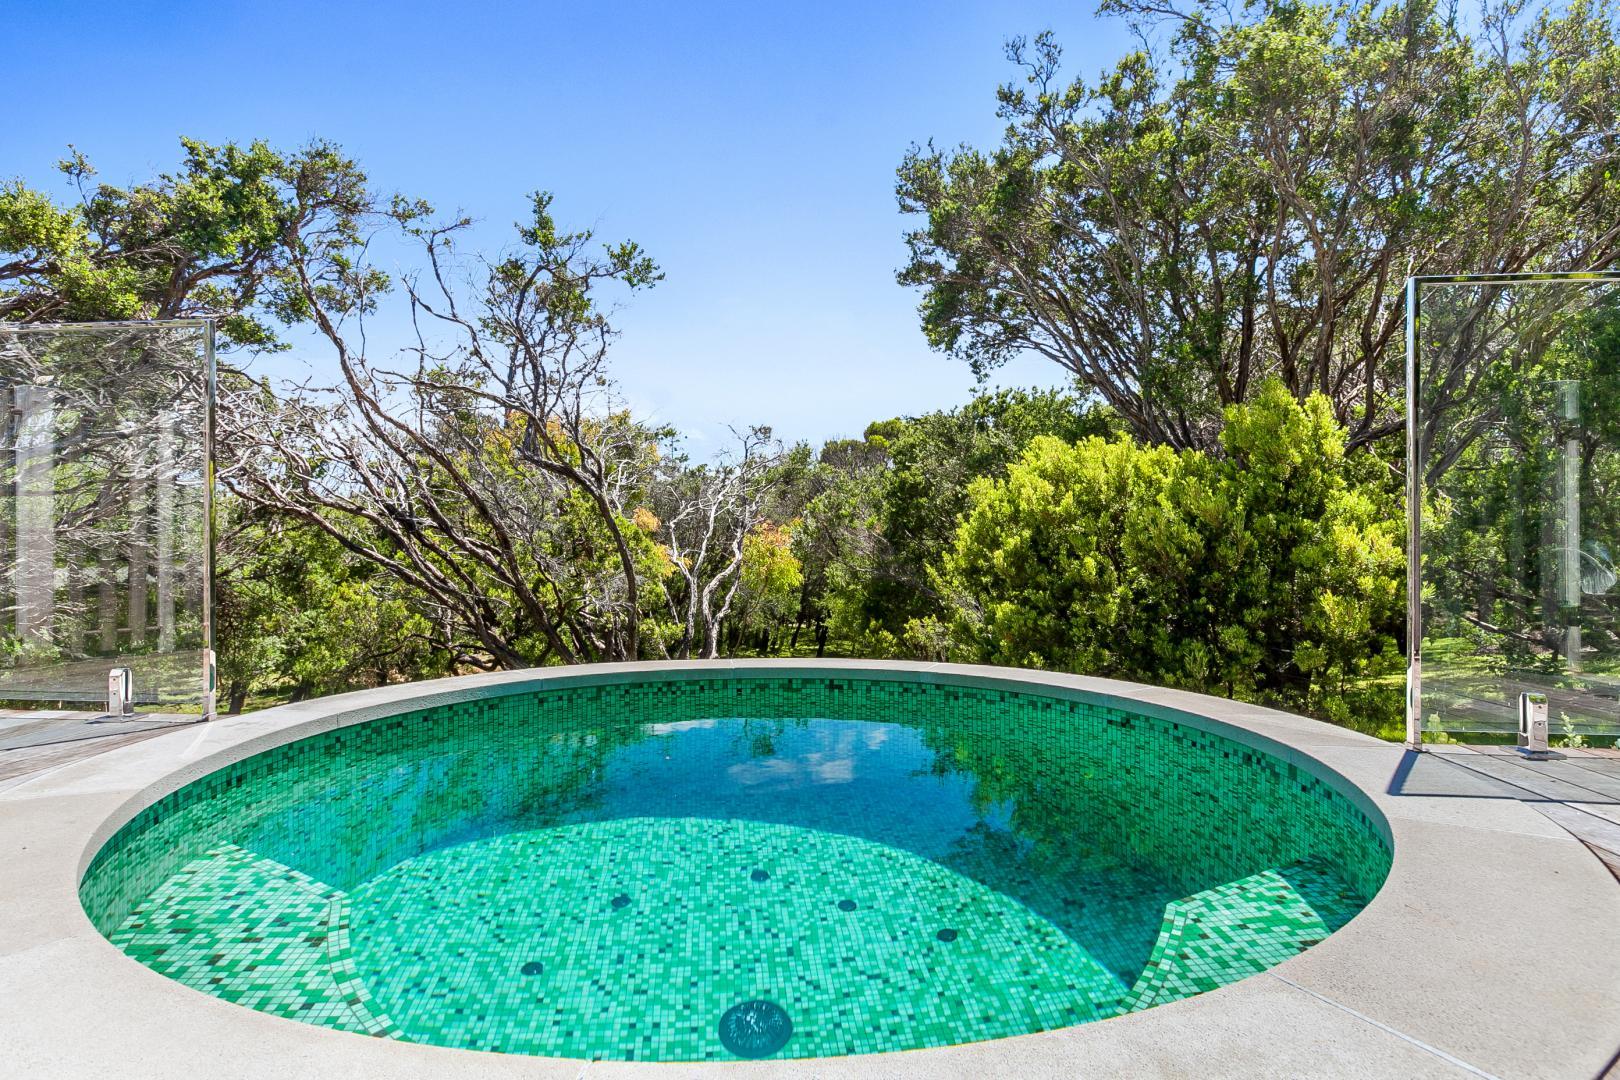 pool builders mornington peninsula rosebud melbourne cheviot pools